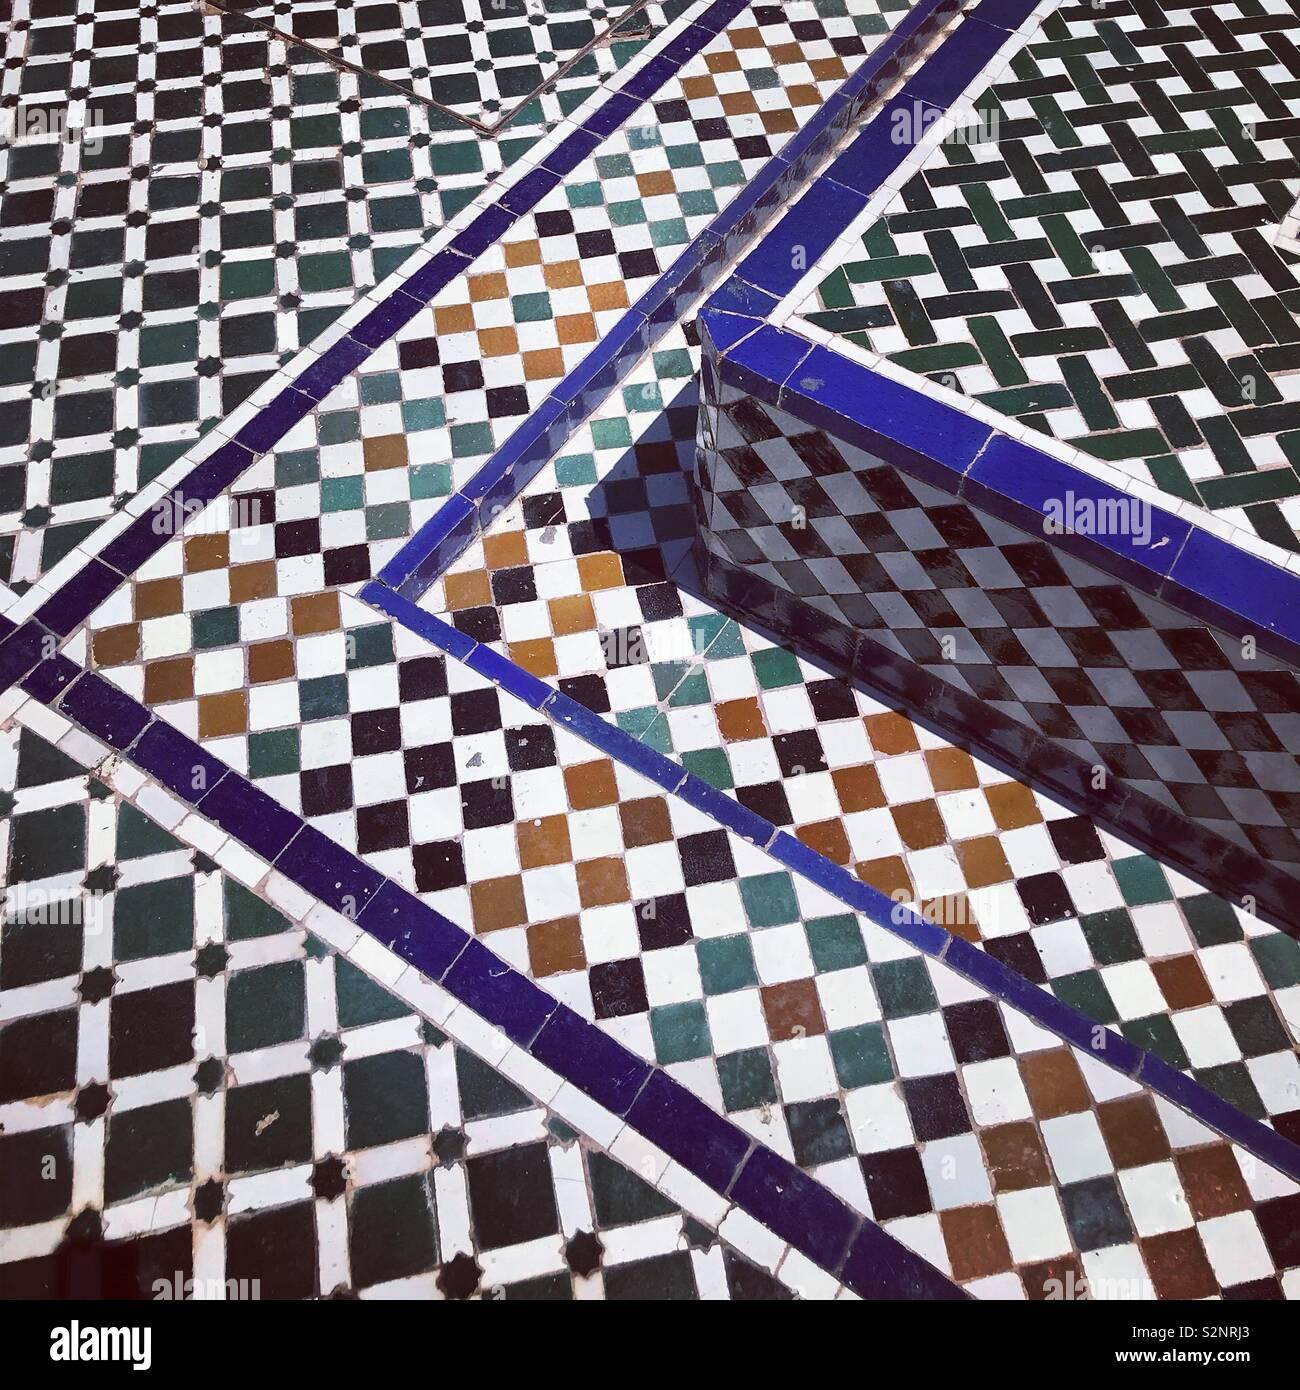 Piso de baldosas del palacio Bahia en Marrakech, Marruecos, Norte de África Imagen De Stock